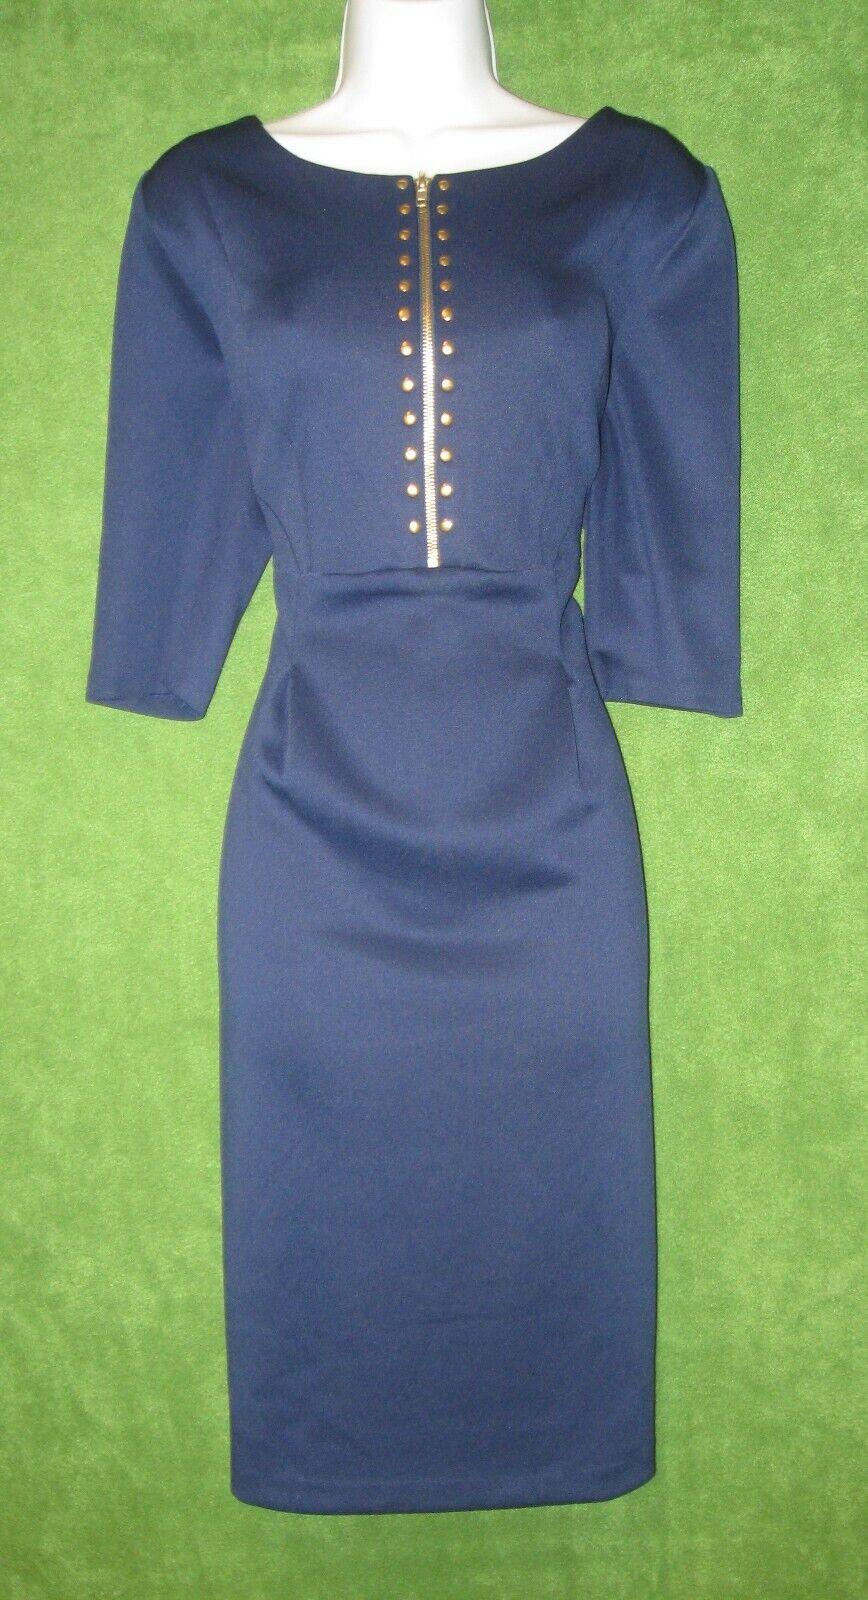 Sangria Navy Blau Gold Studded Stretch Scuba Sheath Work Dress 14  MISC